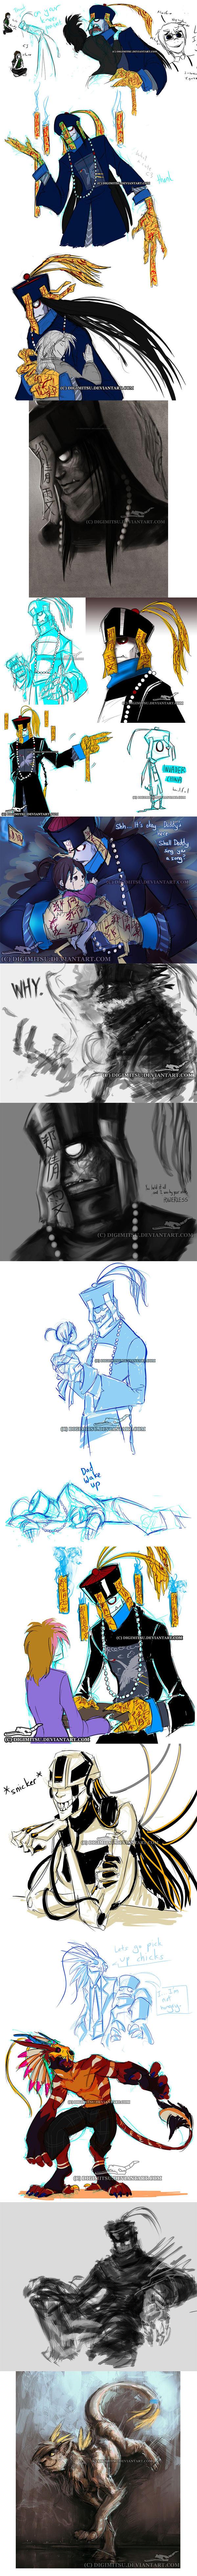 Mr China: Sketchdump 072813 by Digimitsu